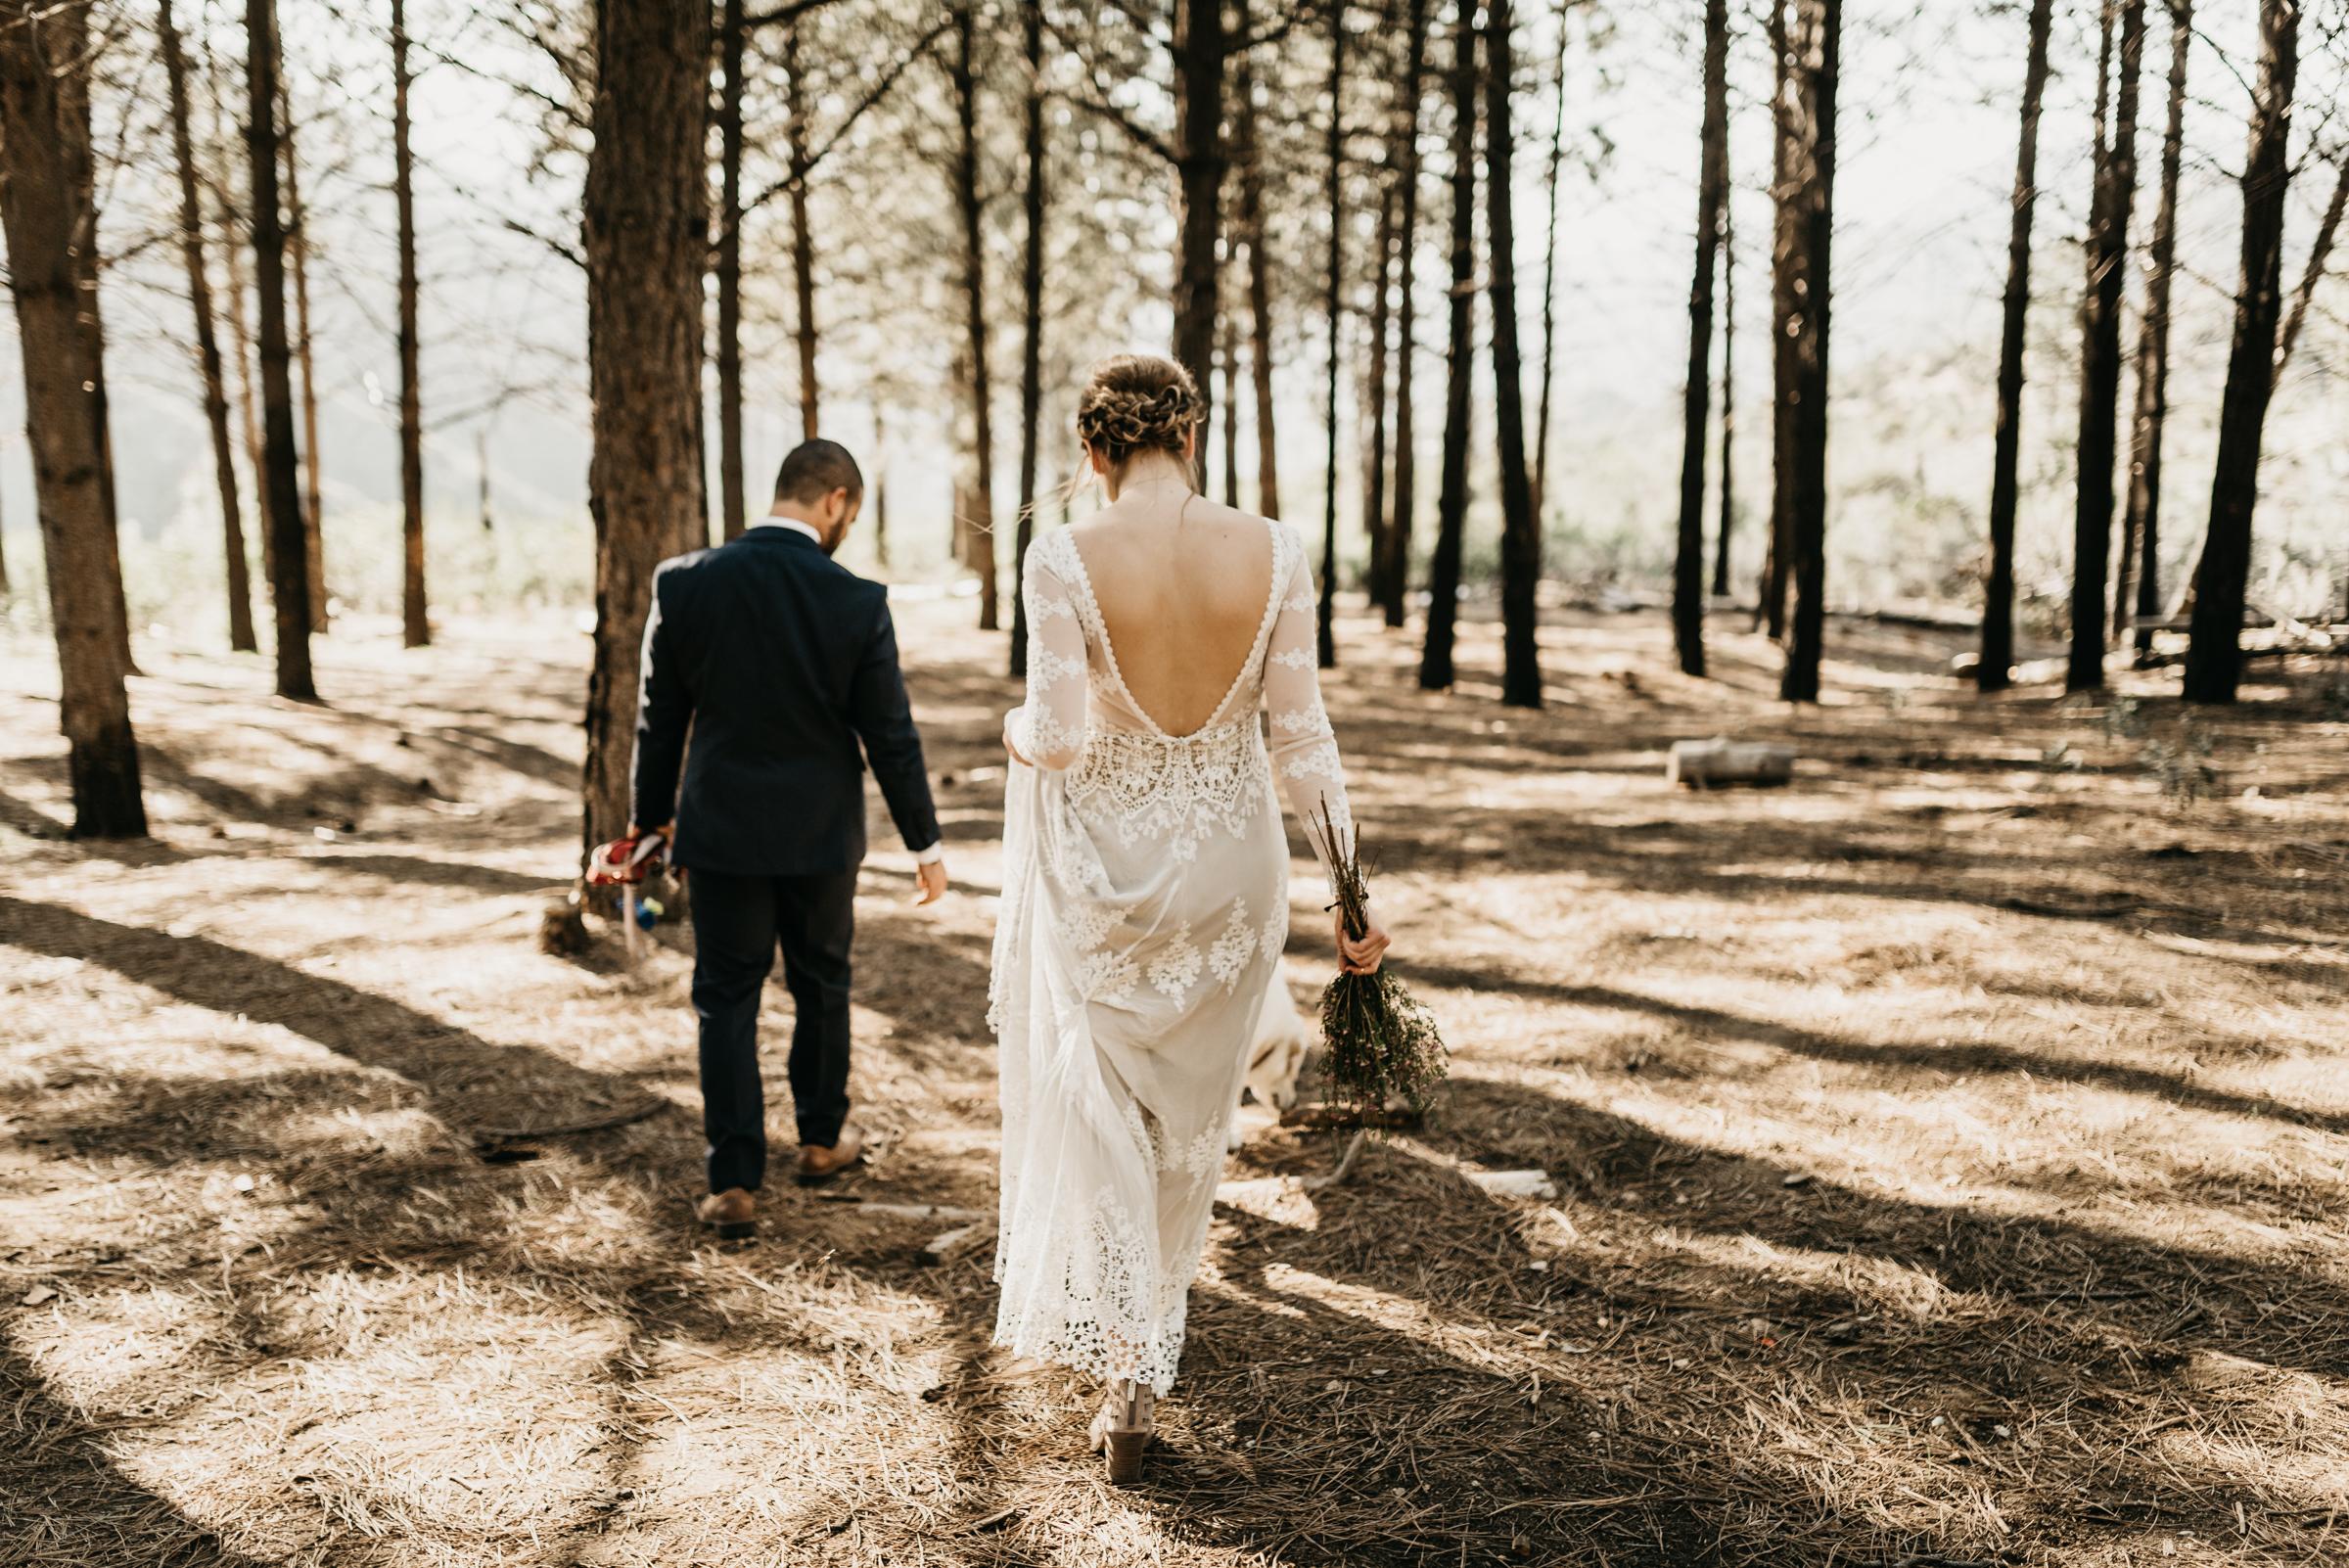 ©Isaiah + Taylor Photography - Los Angeles Wedding Photographers - Los Angeles Forest Wedding -26.jpg